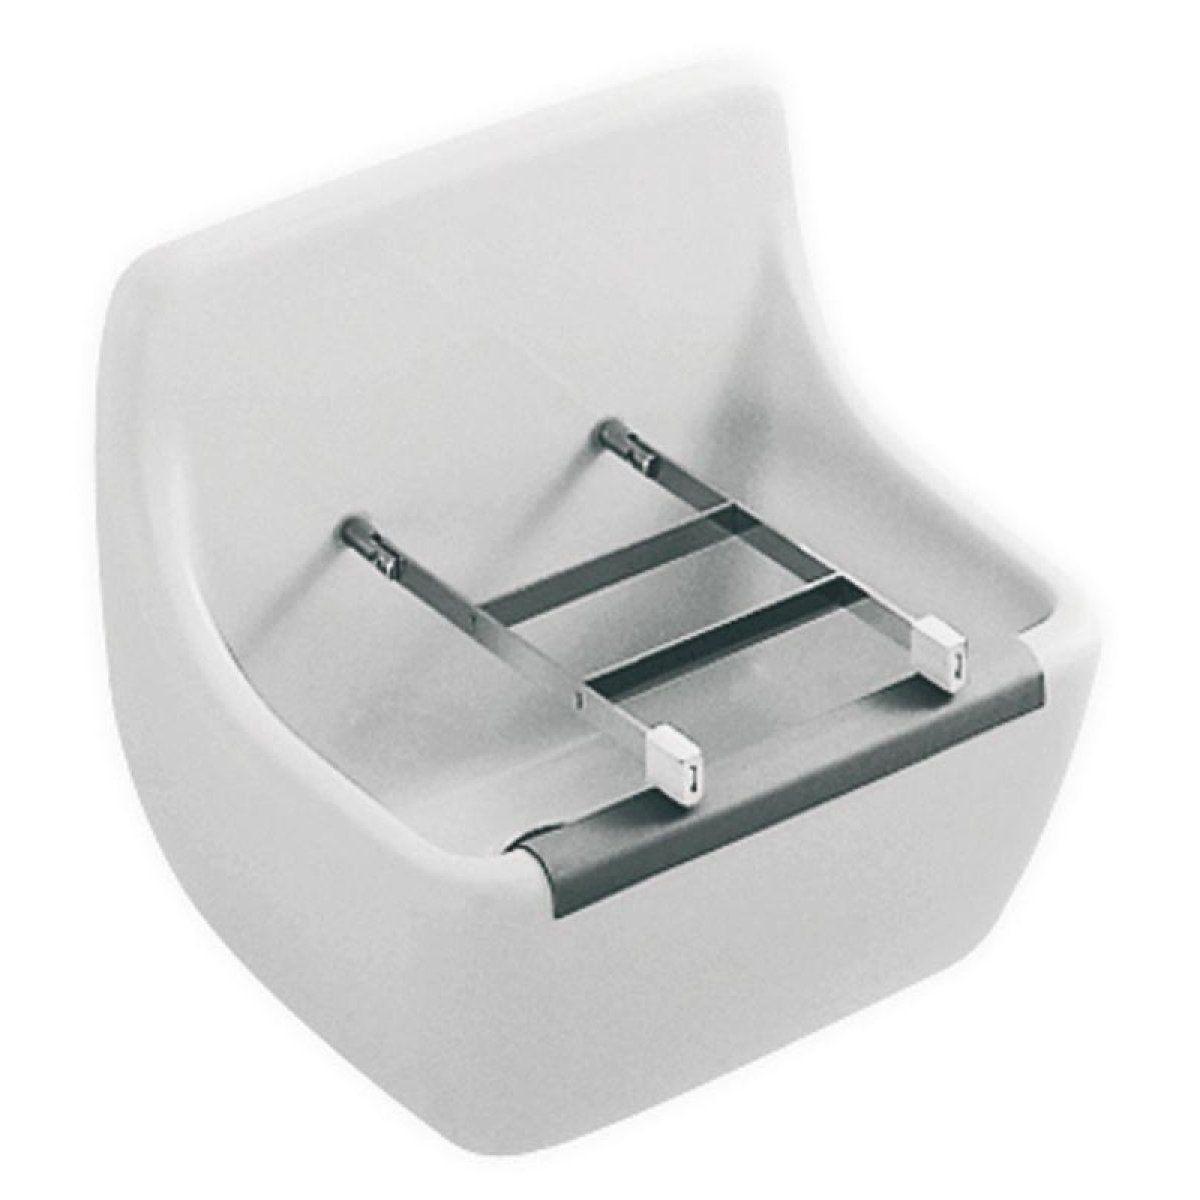 d versoir targa pro 450x400x350 mm blanc alpin ceramicplus 691201r1 villeroy et boch null. Black Bedroom Furniture Sets. Home Design Ideas